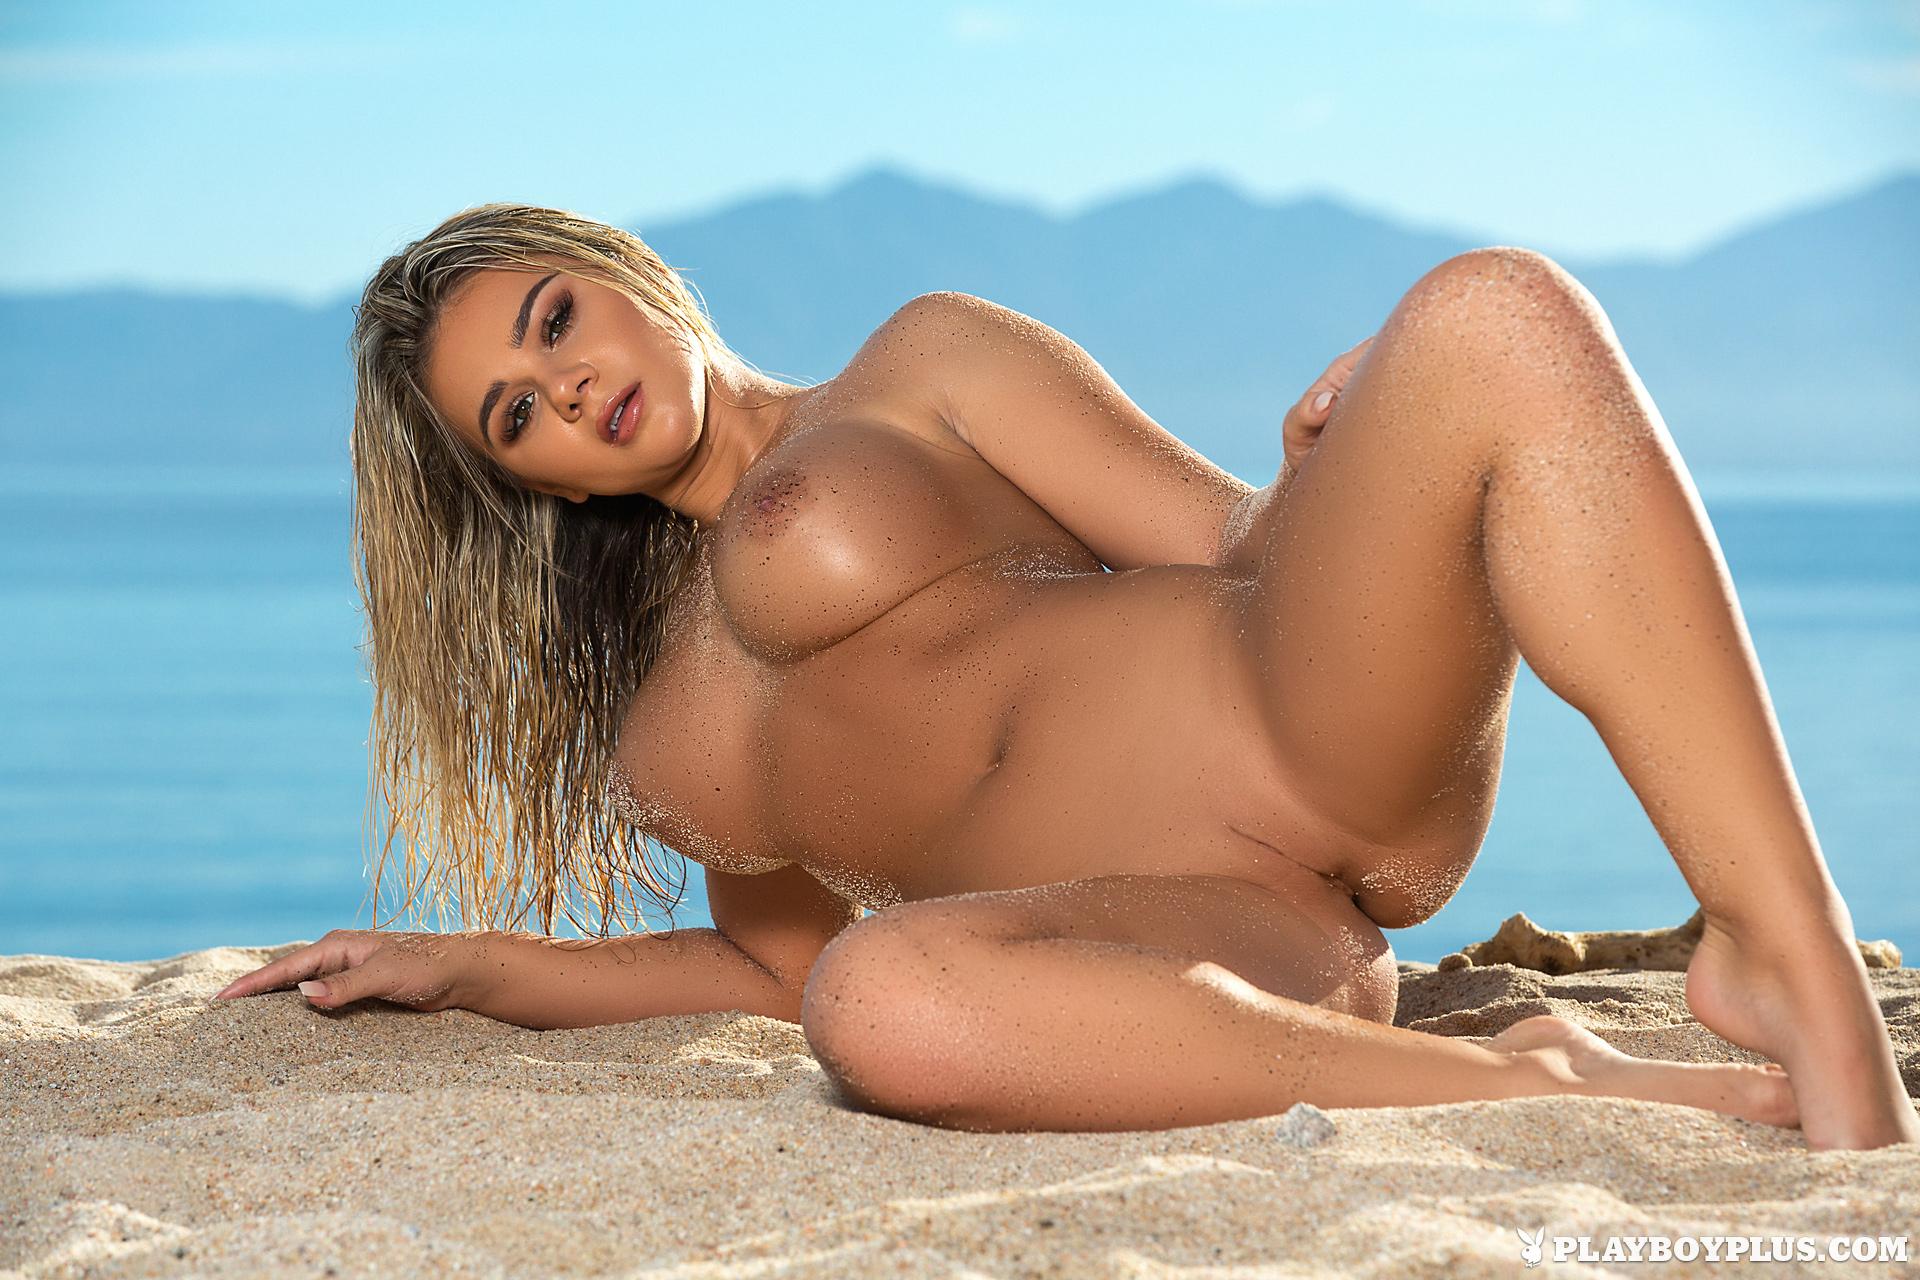 tahlia-paris-beach-bikini-seaside-boobs-blonde-playboy-20